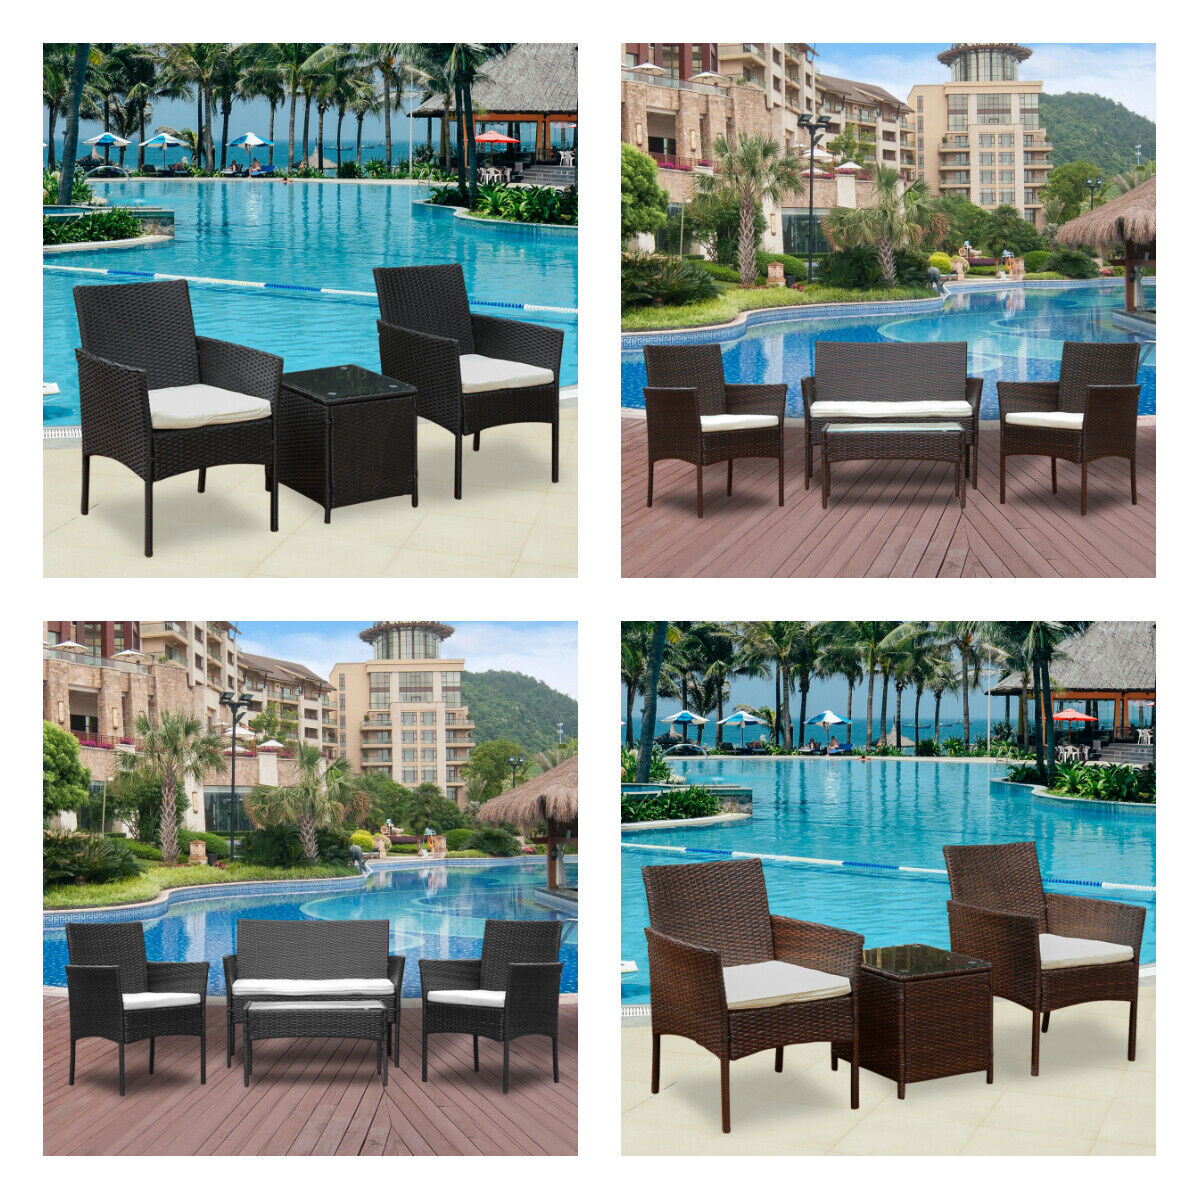 Garden Furniture - 3/4Pcs Rattan Garden Furniture Set Table Chair Sofa Table Outdoor Patio Set Yard